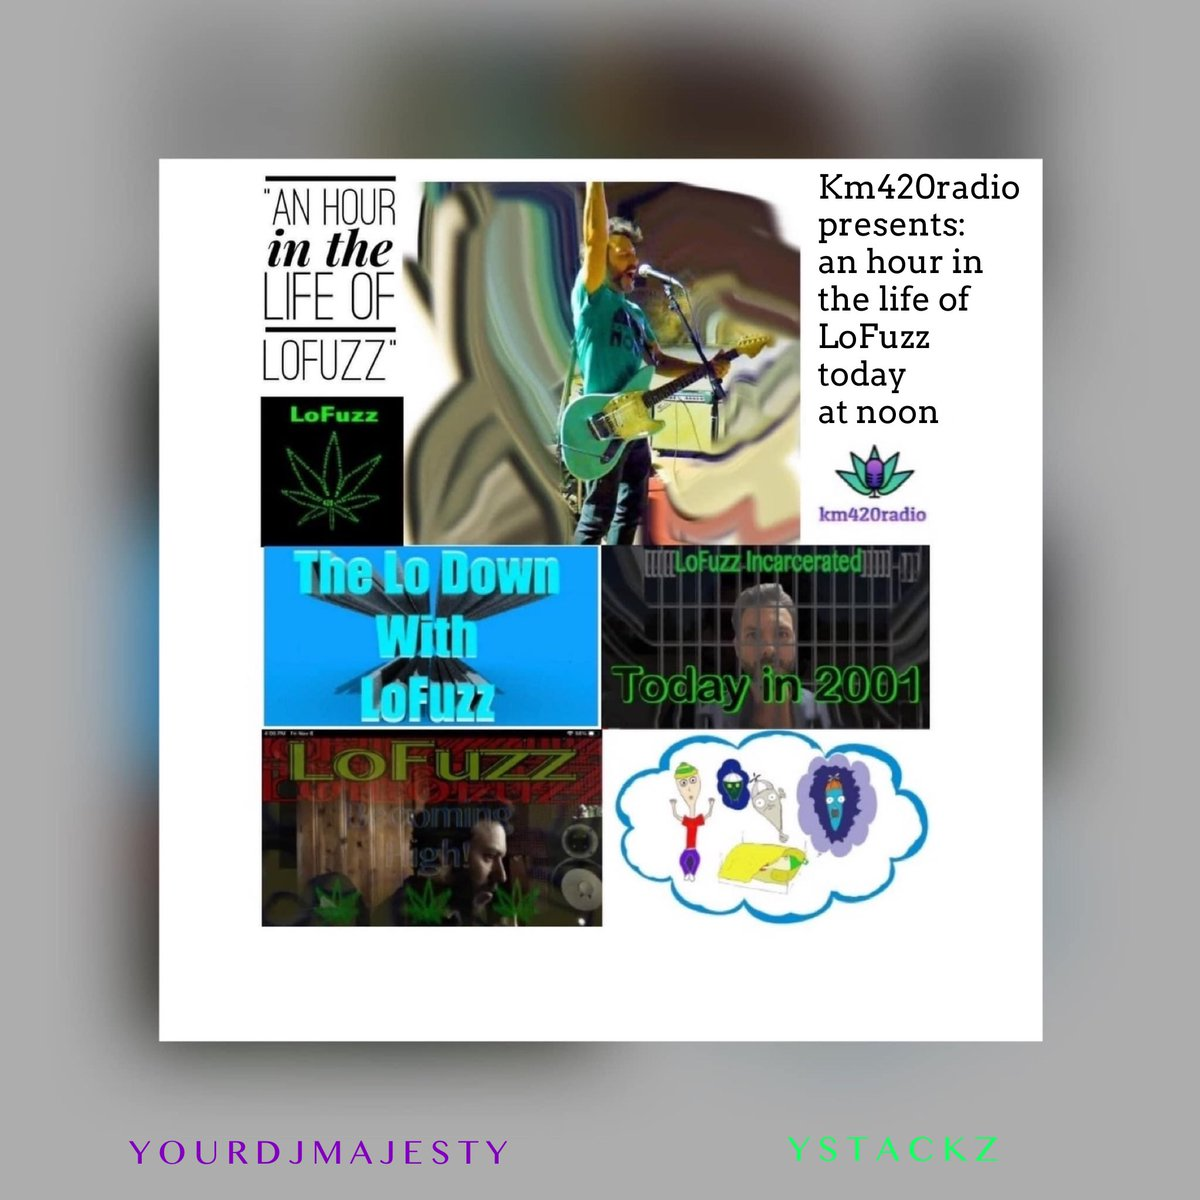 12:00 PM CST 🔥  🔥  #jonathanandhisstories #lofuzzmusic #Livestream  #music #indie #artist #love #bluesrockandroll #anomaloussaounds  #amazon #thursdayvibes #ThursdayMotivation #becominghigh #420friendly